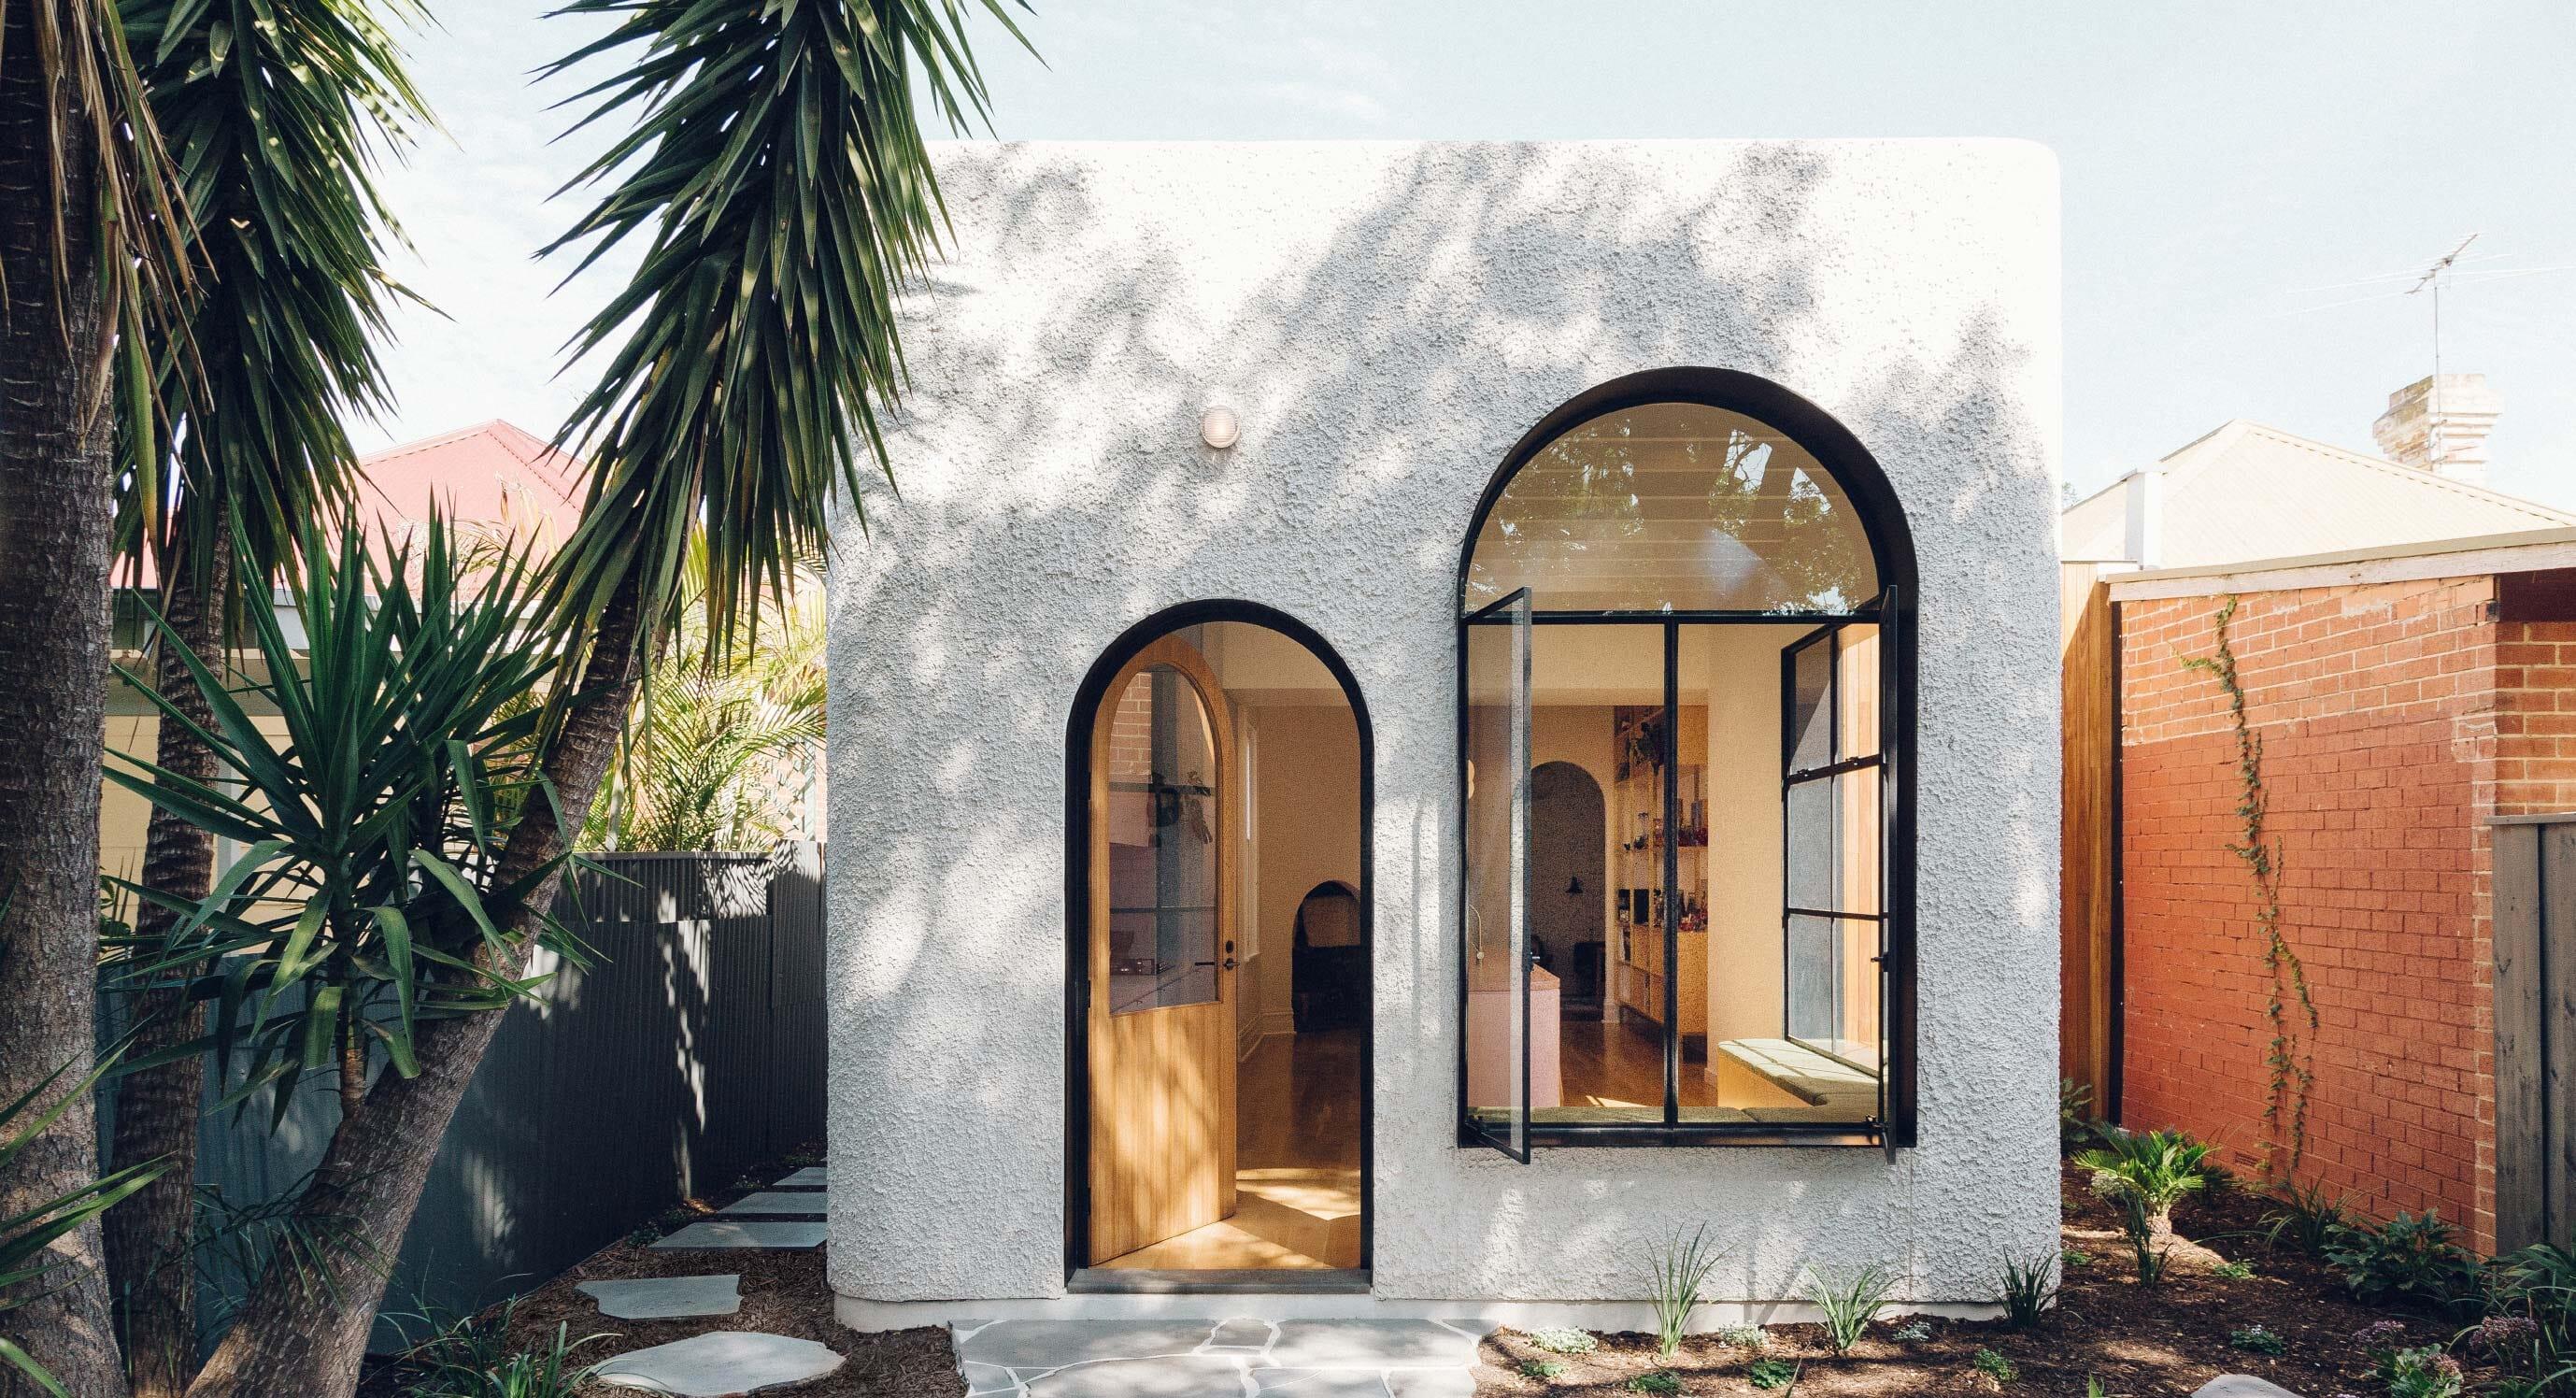 Sans-Arc Studio's Plaster Fun House Pays Homage To Art Deco